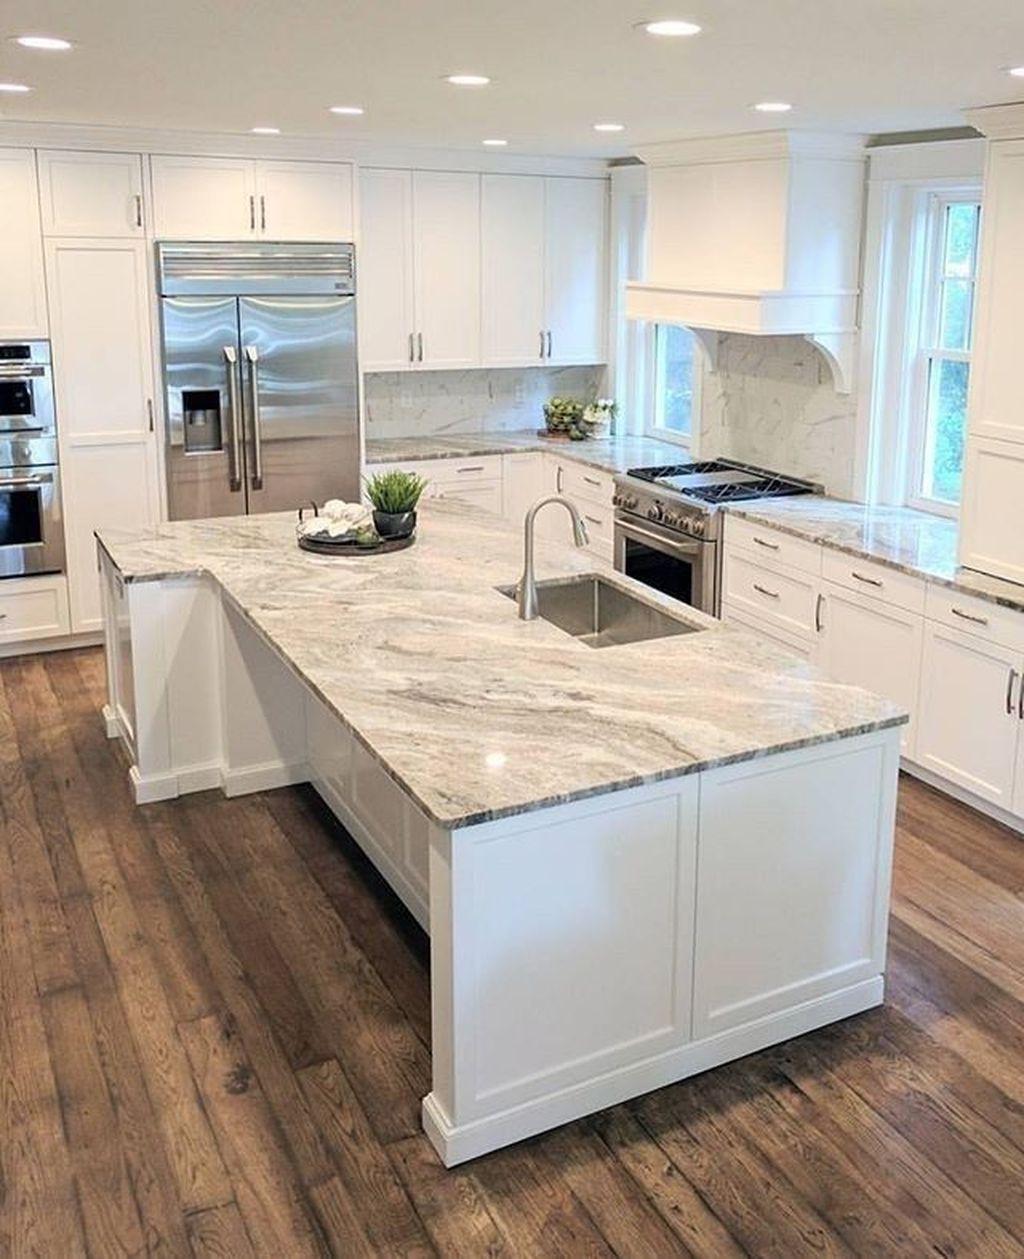 Brilliant Small Kitchen Remodel Design Ideas On A Budget 11